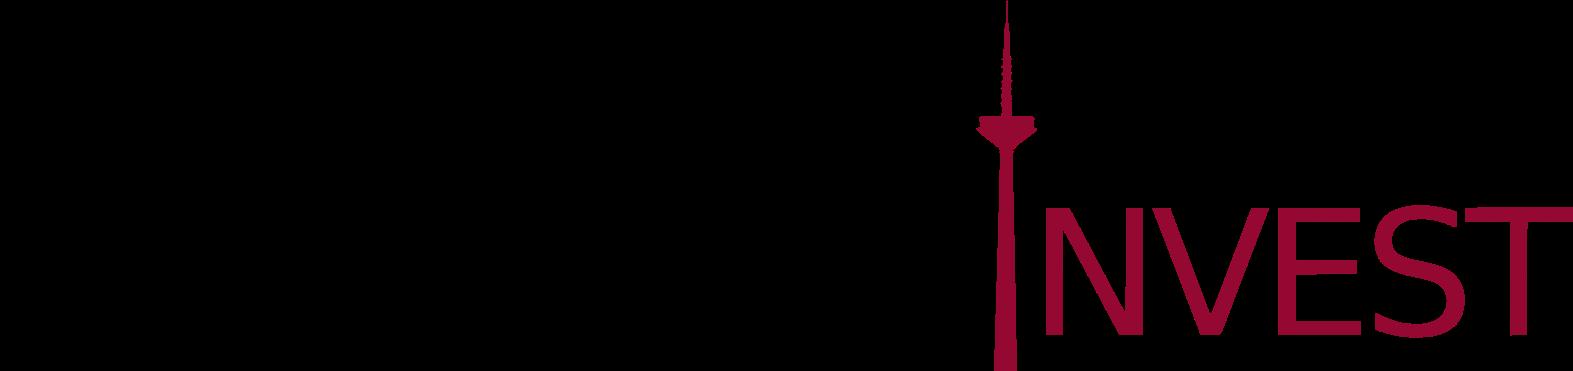 Frankfurt-Invest Logo